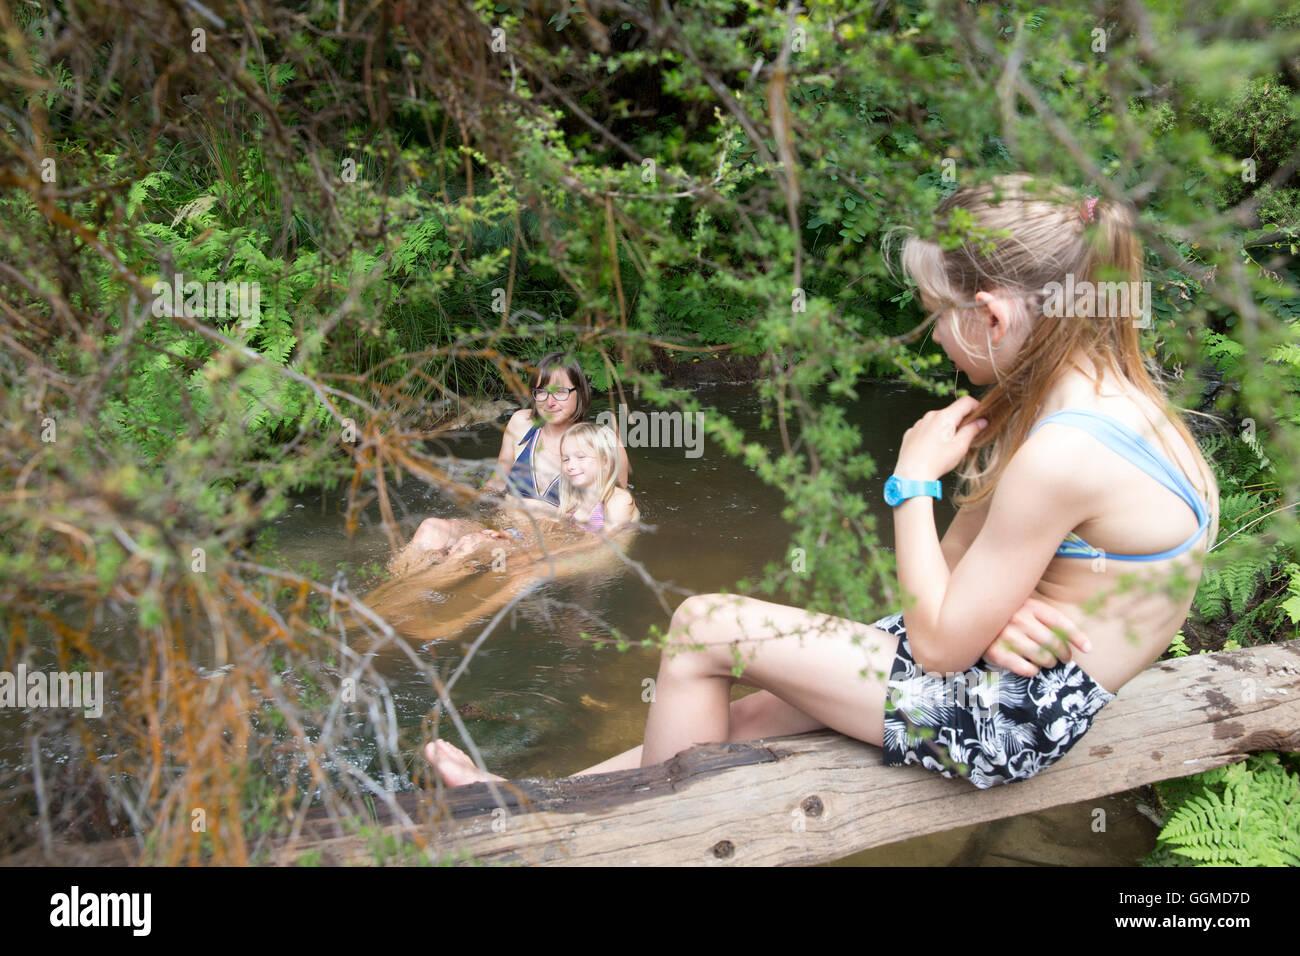 Taking a bath in the thermal river, Kerosene Creek, close to Rotorua, North Island, New Zealand - Stock Image